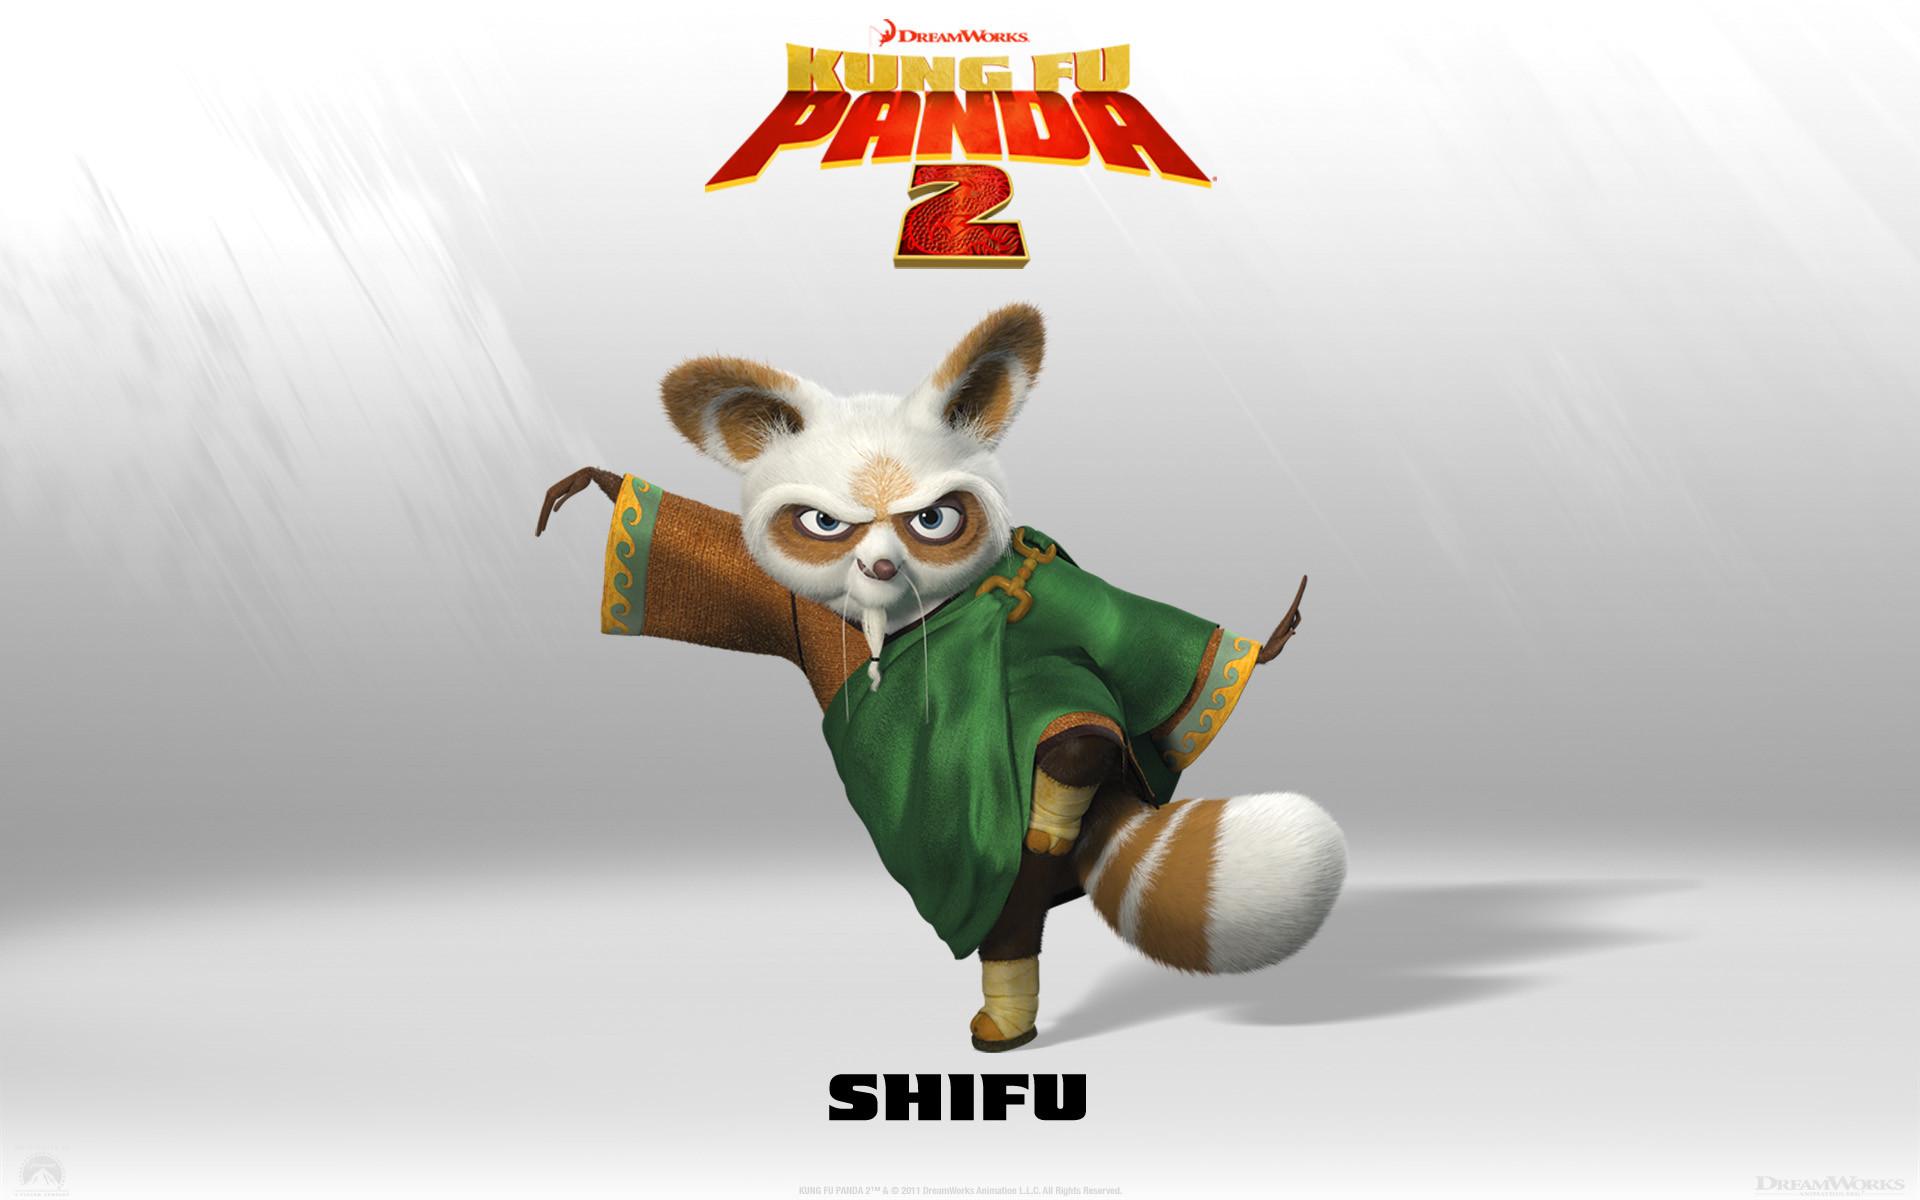 Master Shifu from Kung Fu Panda 2 Dreamworks CG animated movie wallpaper